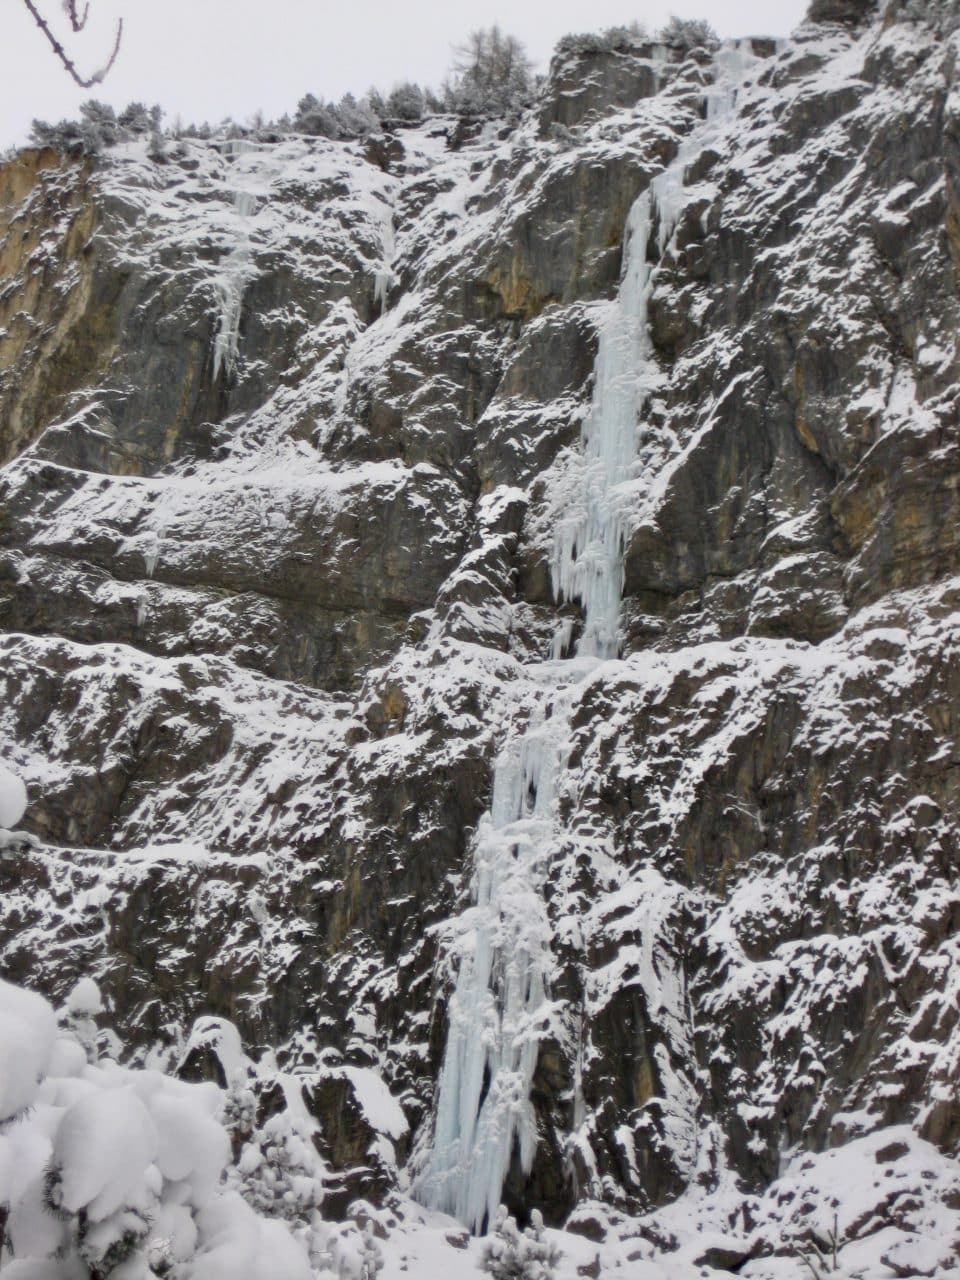 Cascade de glace, Kandersteg